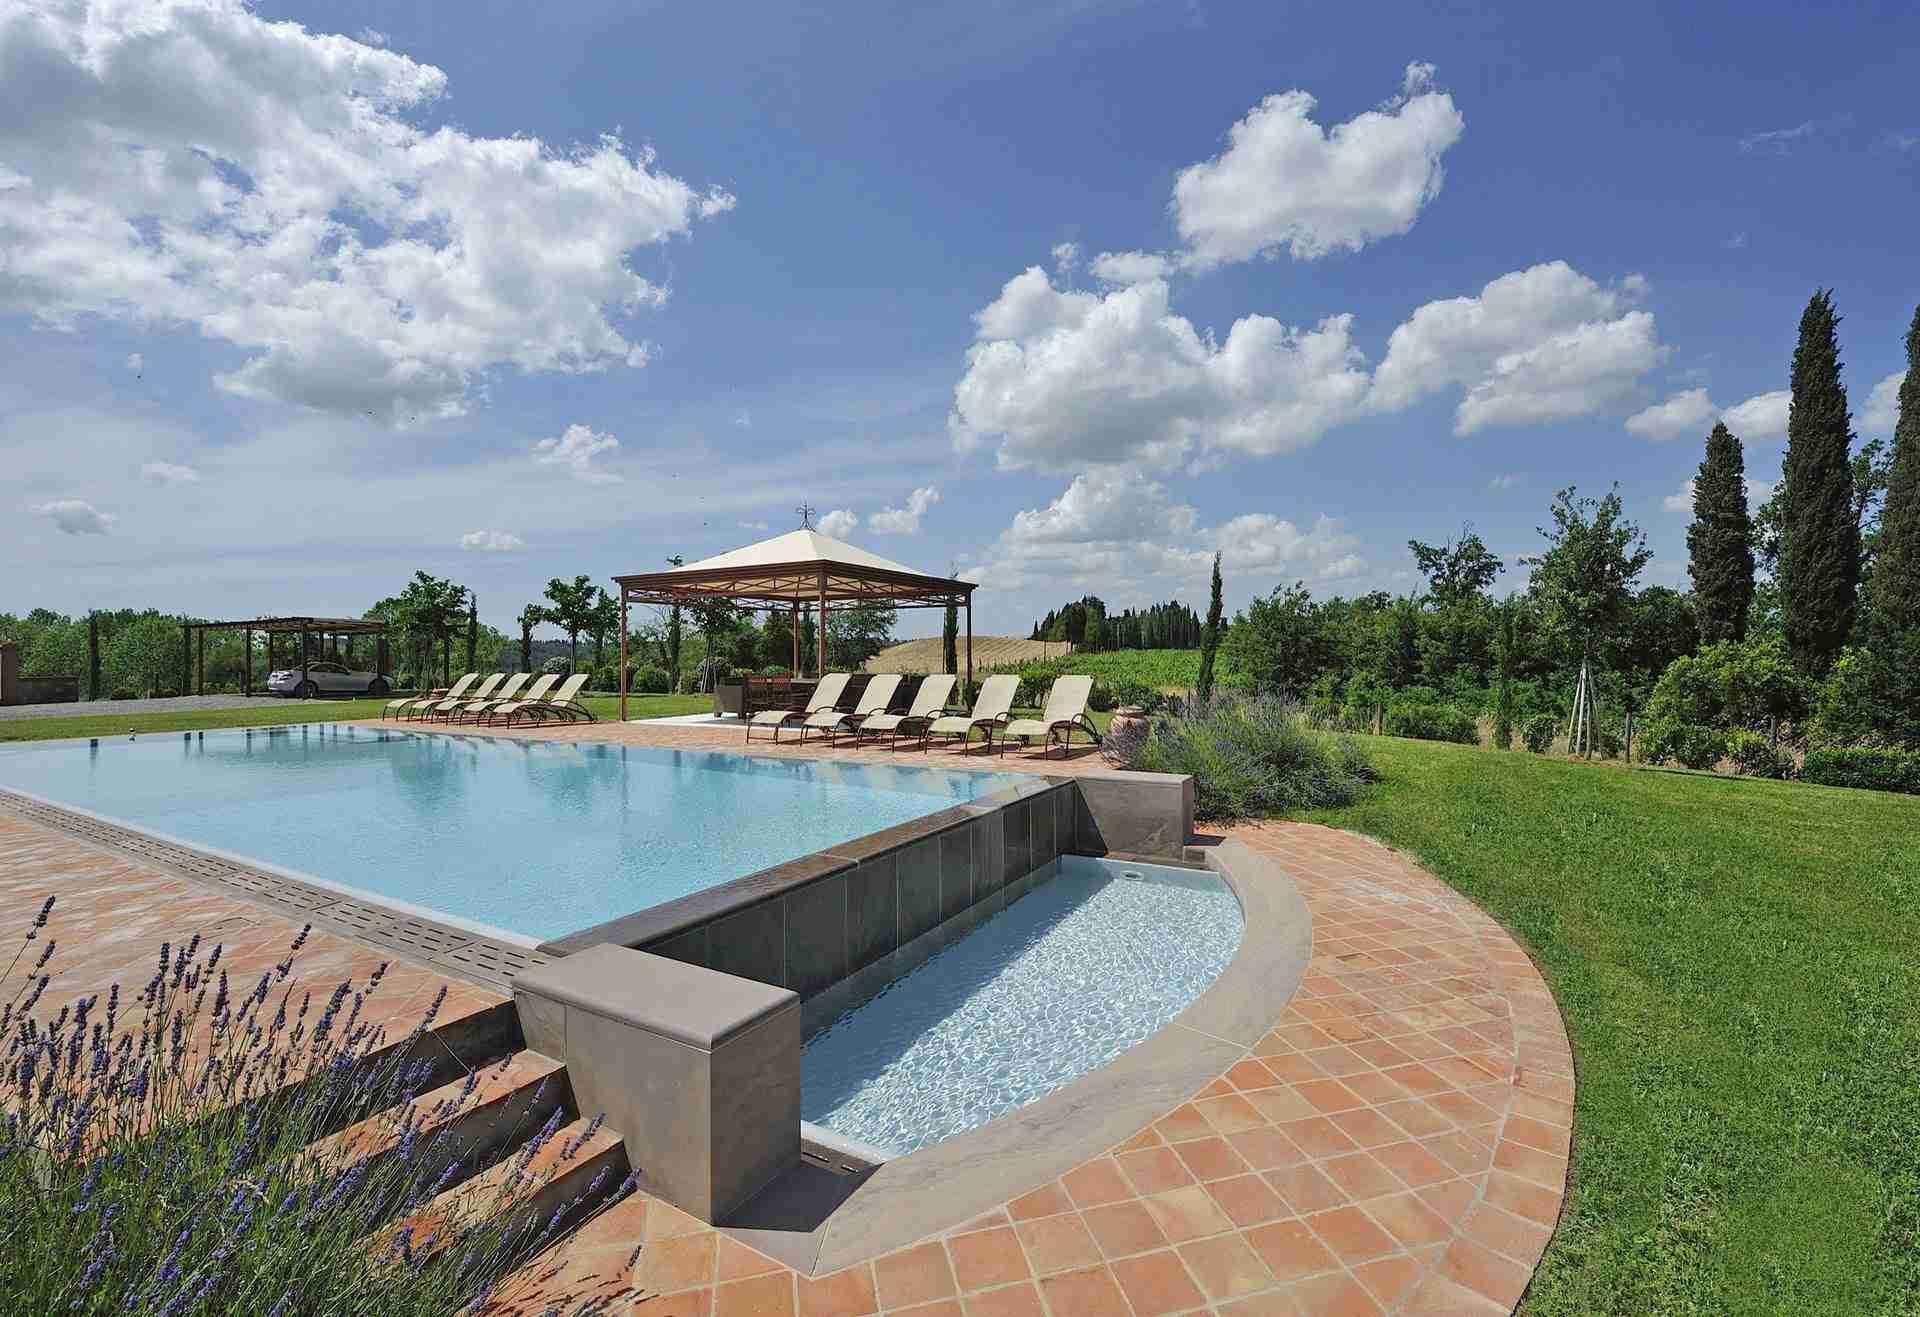 21 Dante Outdoor Pool